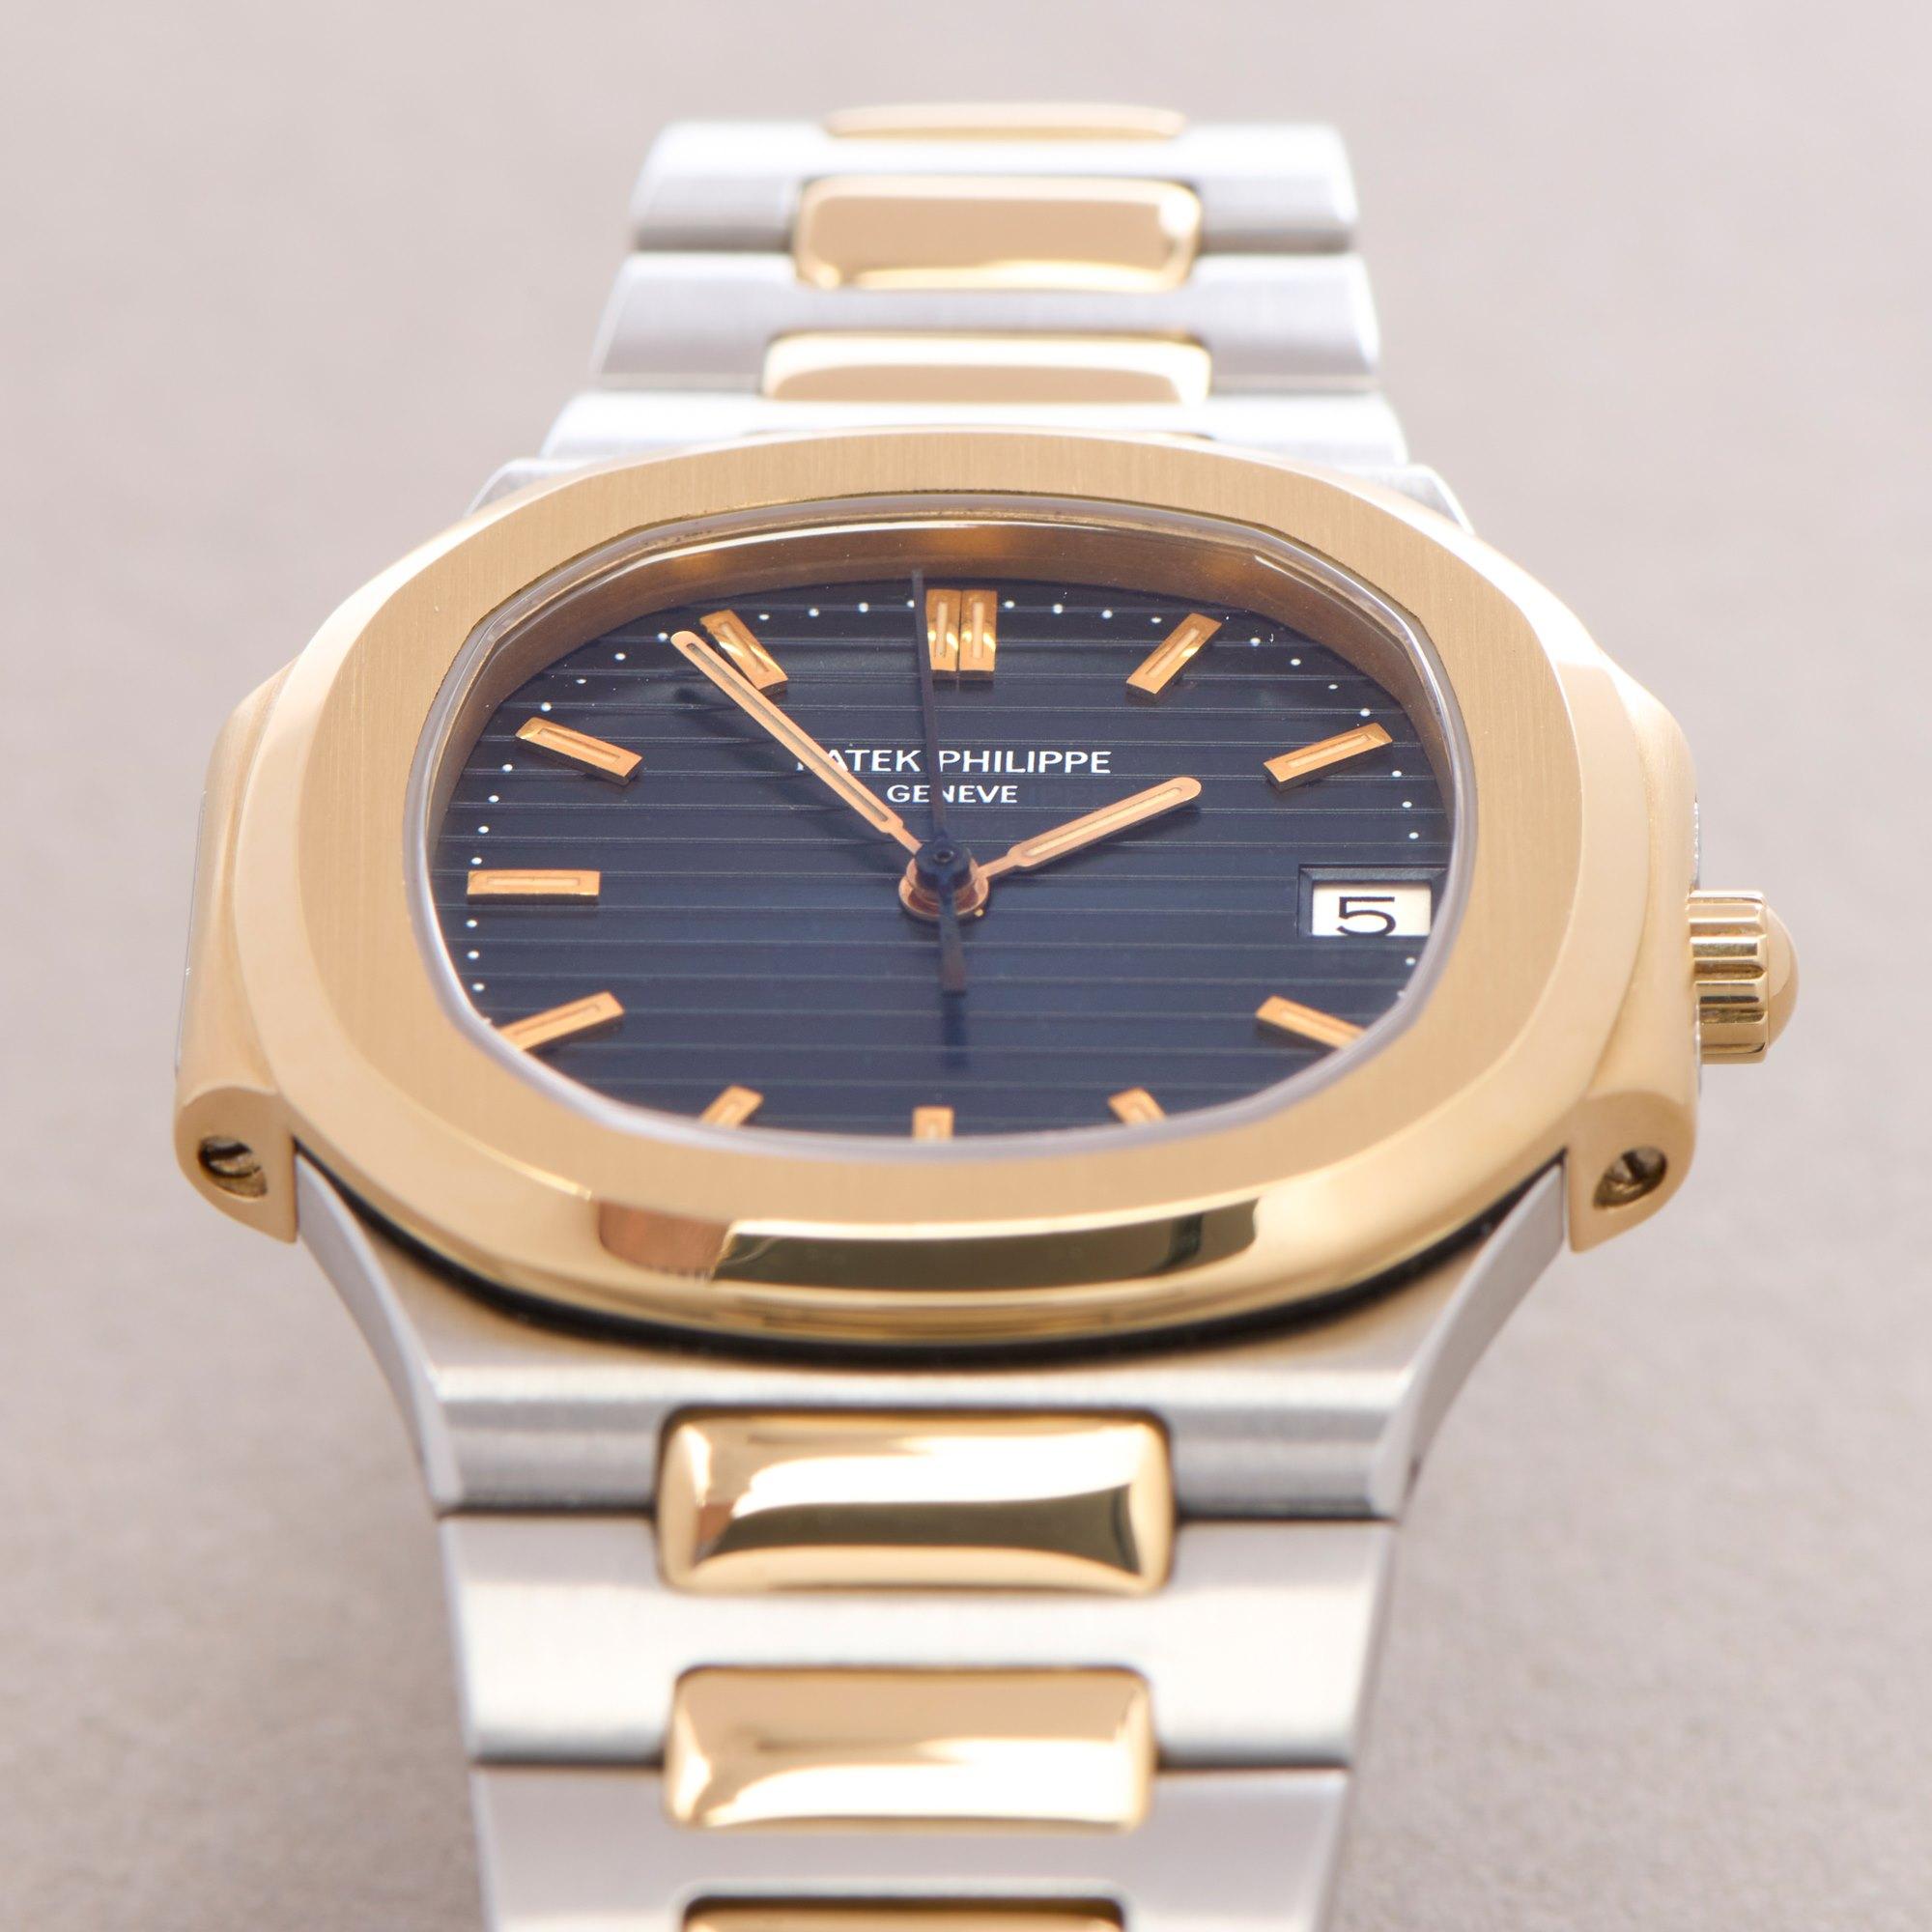 Patek Philippe Nautilus 18K Yellow Gold & Stainless Steel 3900